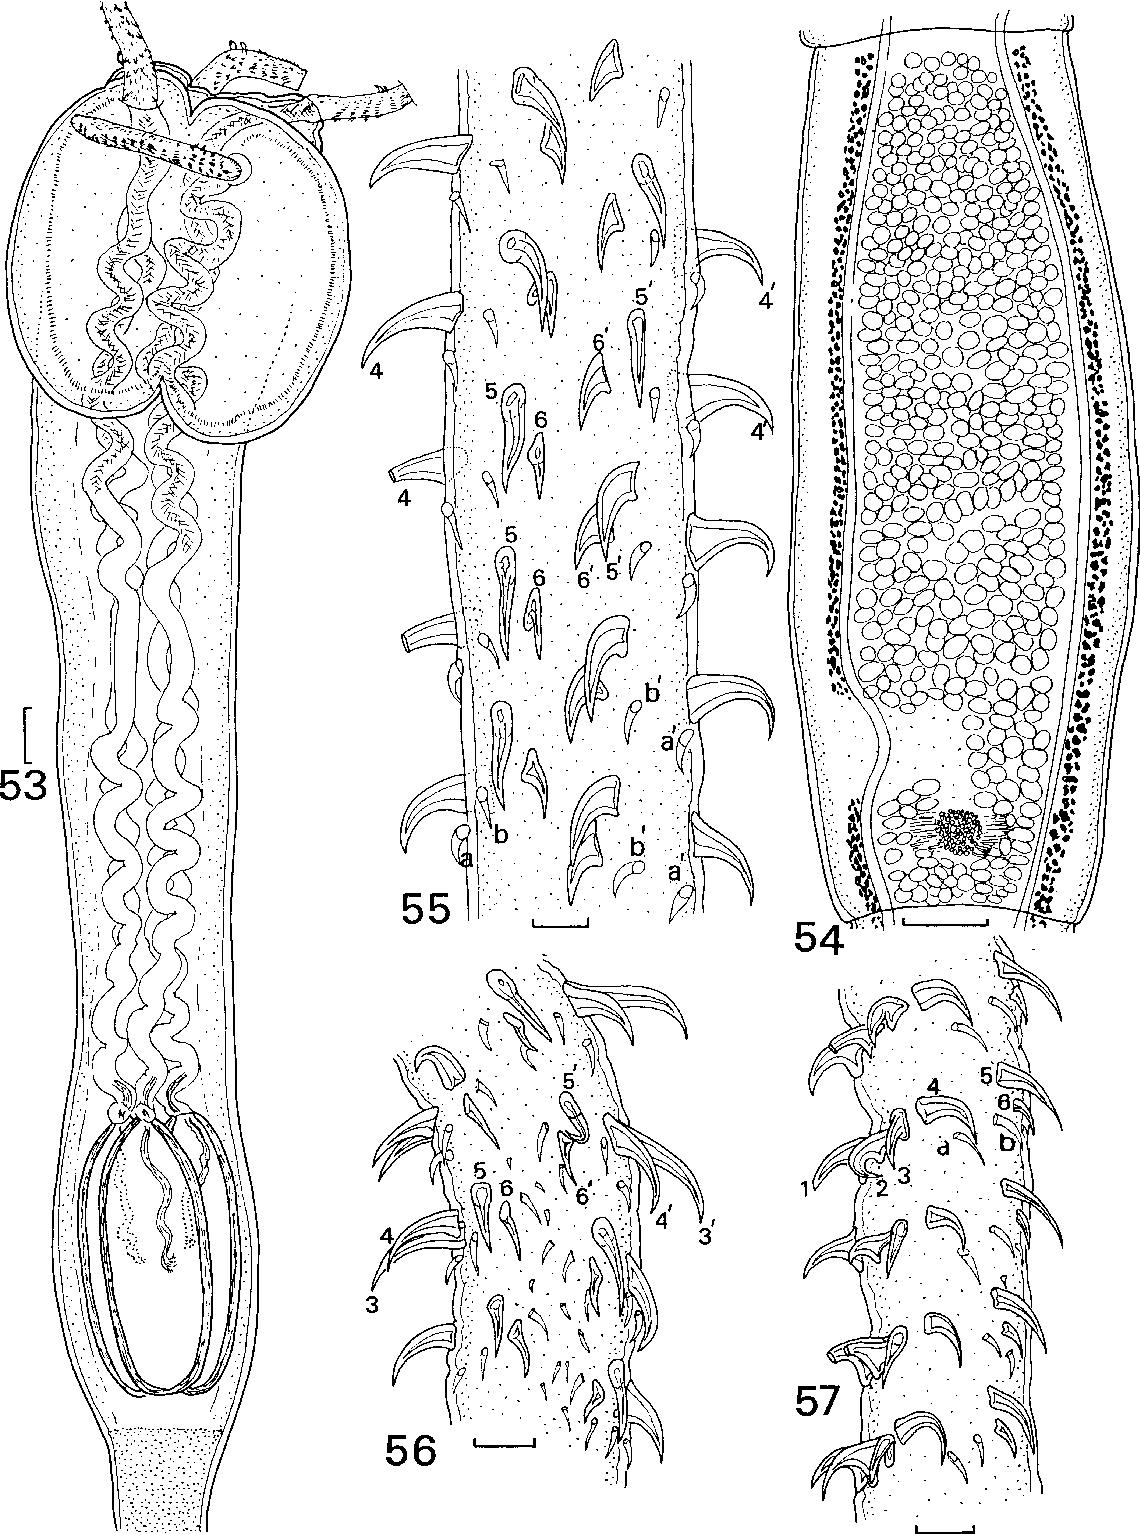 figure 53-57